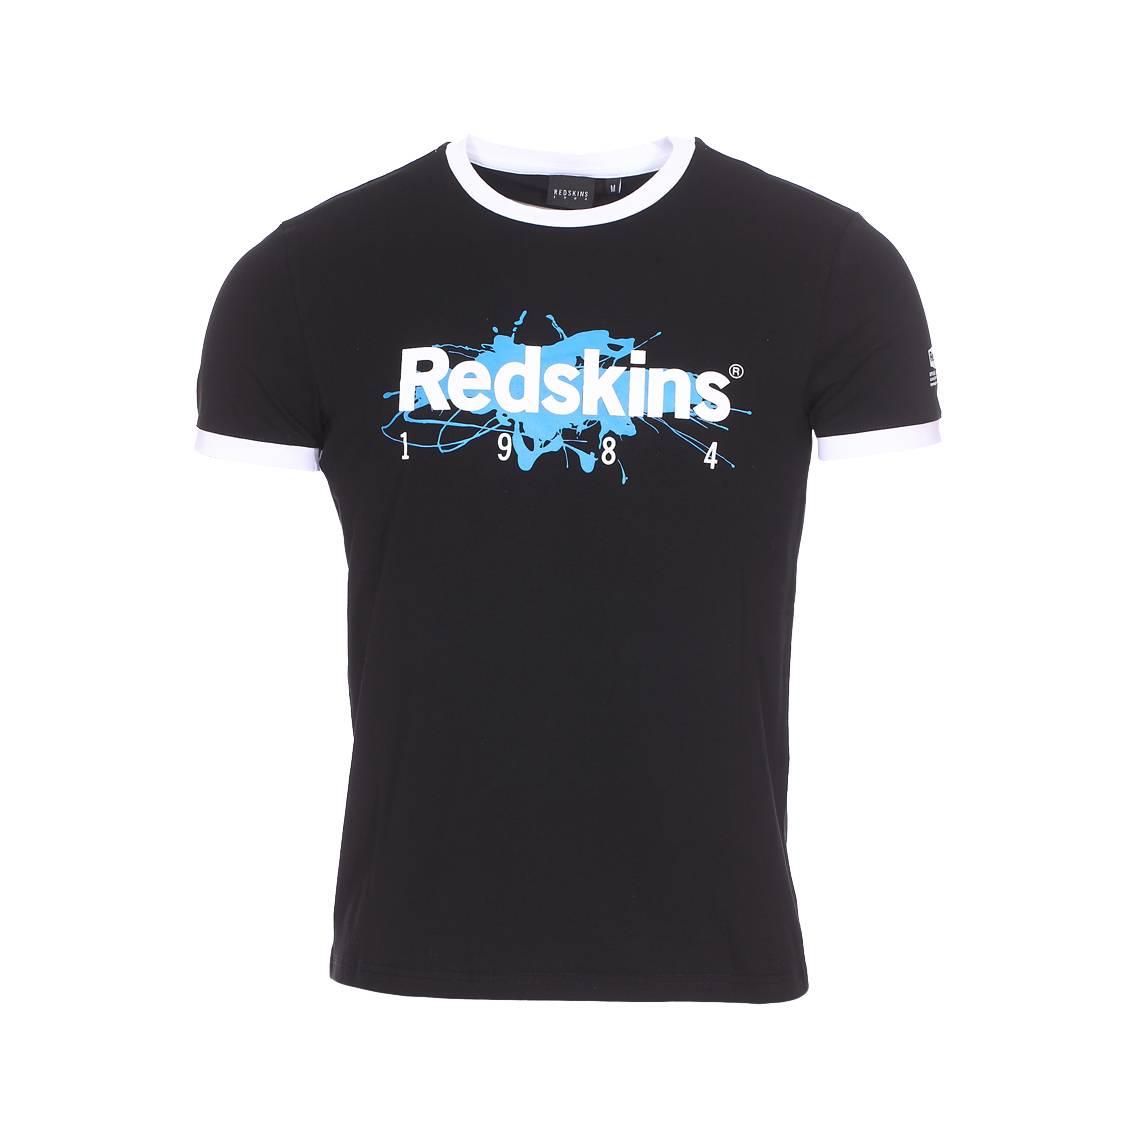 Tee-shirt col rond  kana calder en coton stretch noir floqué en bleu et blanc